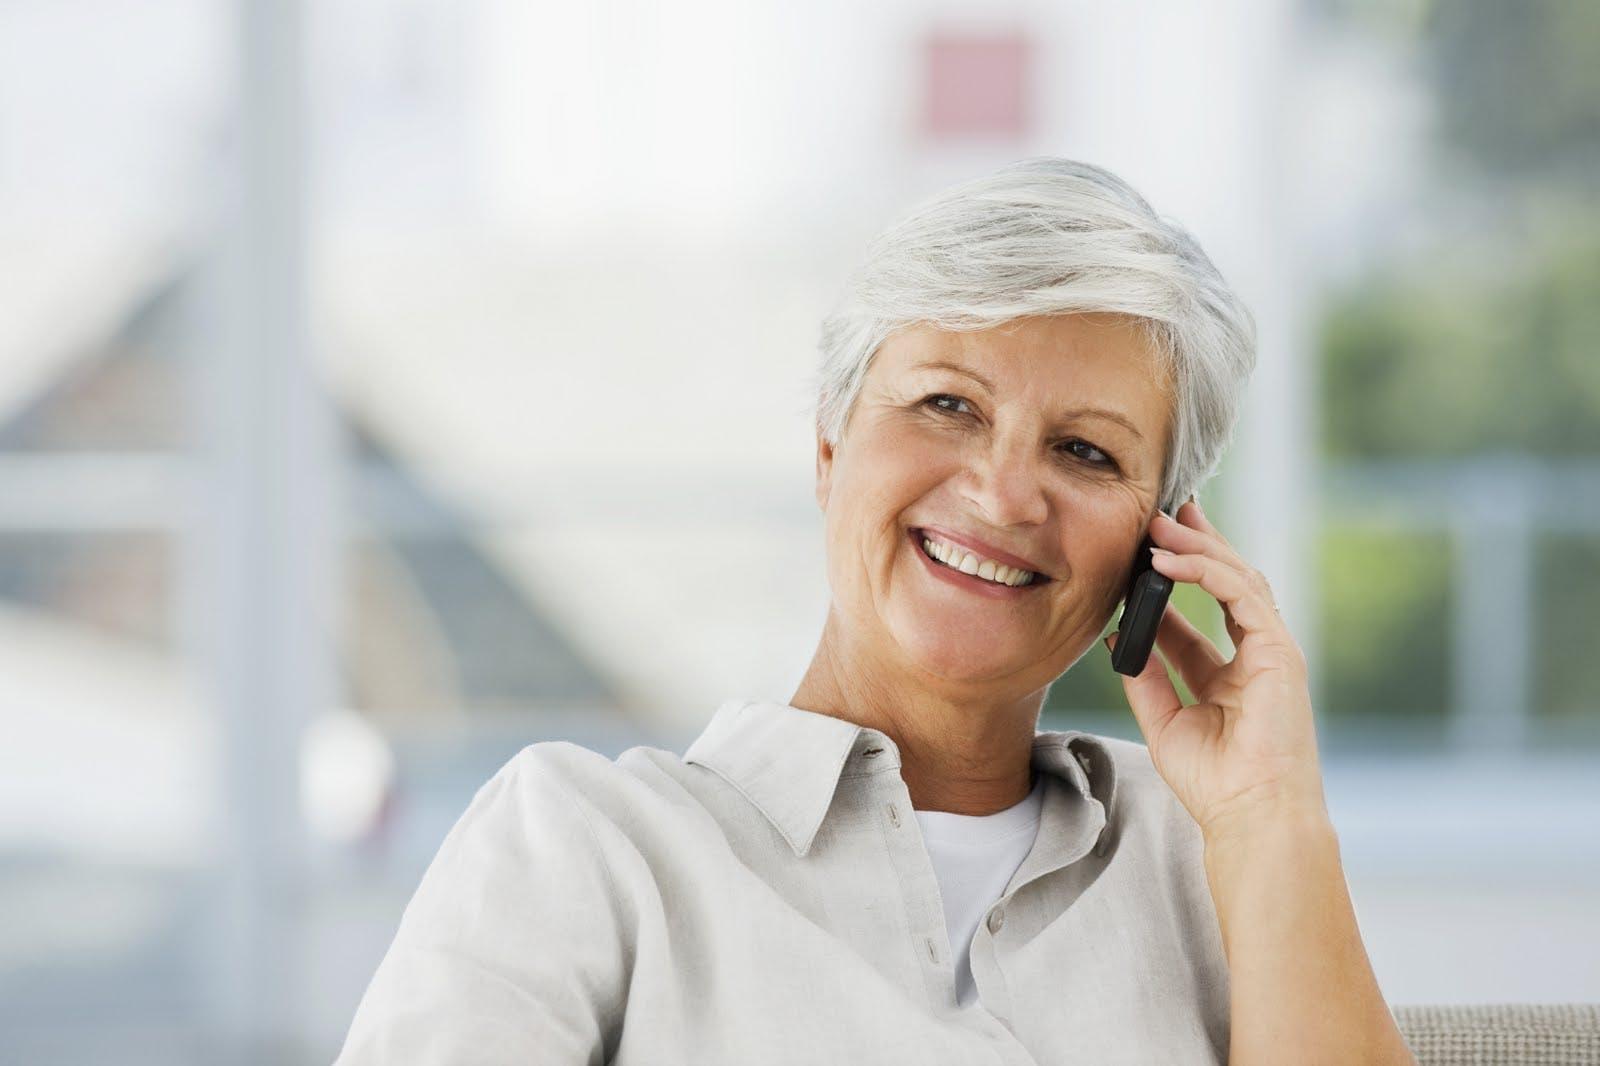 Doro 8030 - Finally A Suitable Smartphone for Seniors